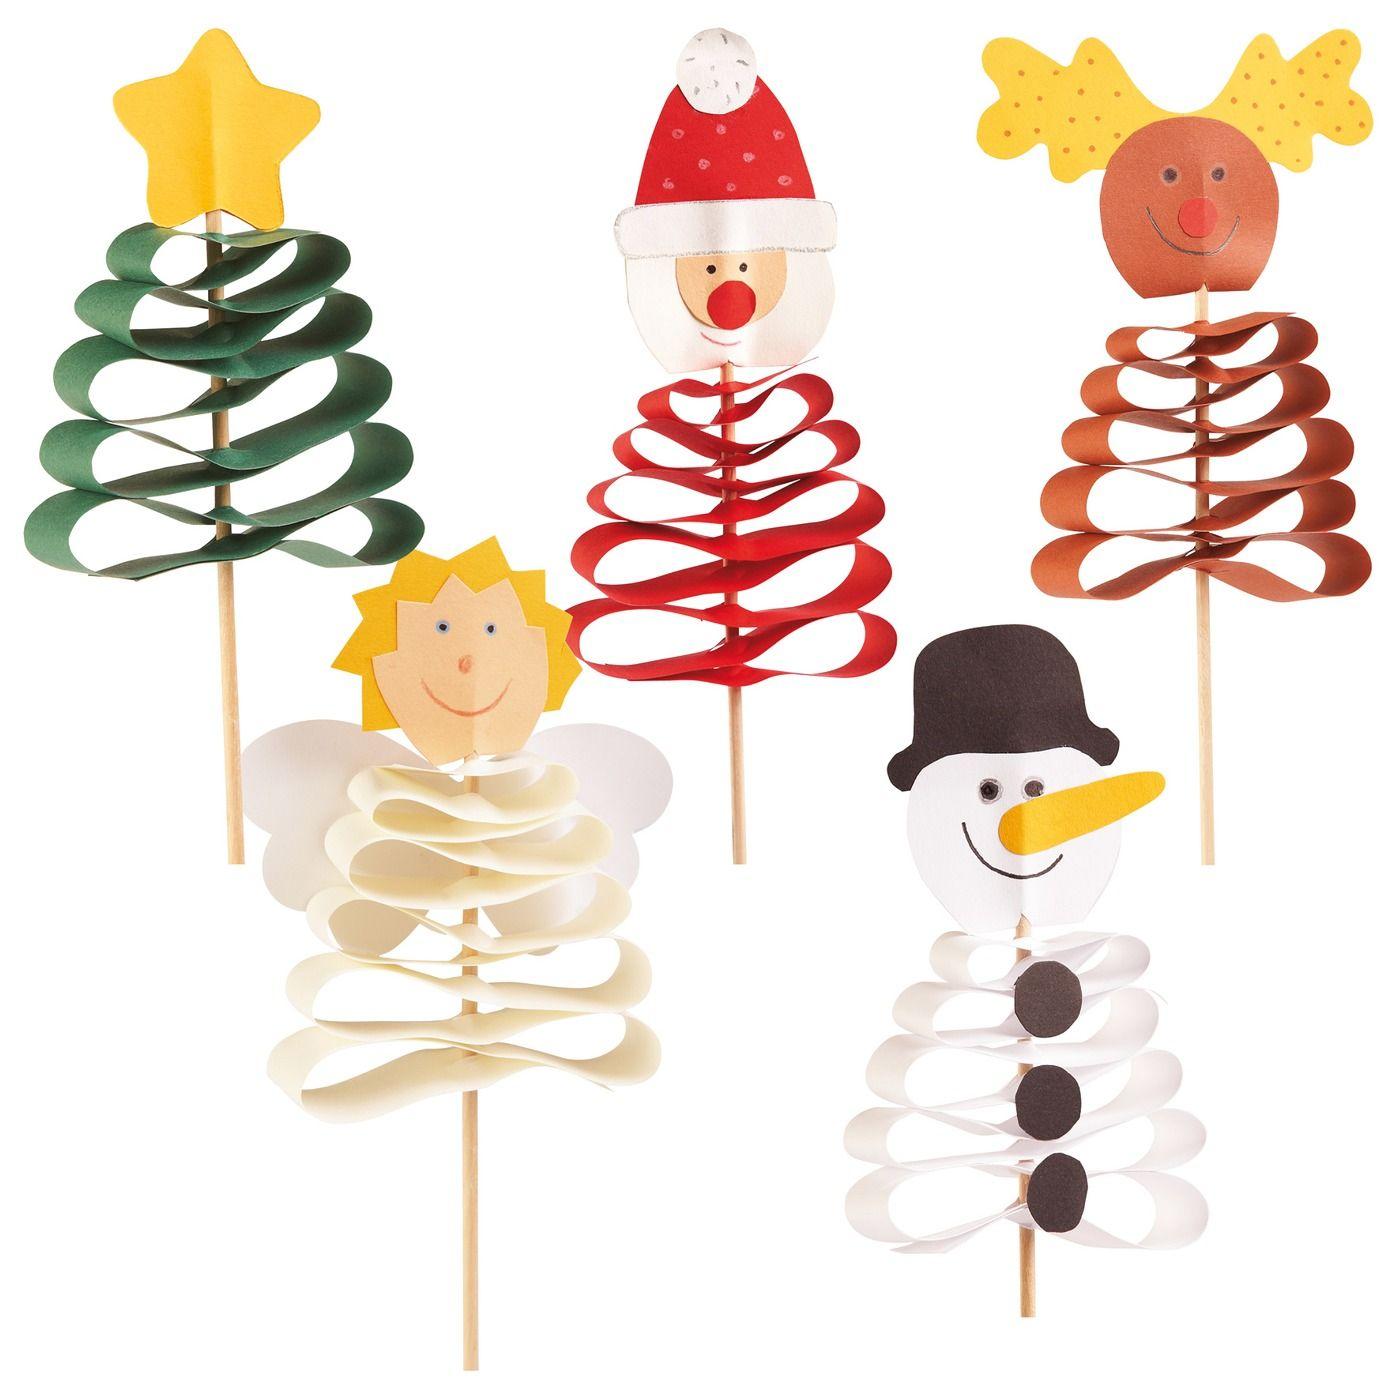 Easy Paper Strip Christmas Ornaments Kids Can Make: Best 25+ Sachenmacher Ideas On Pinterest